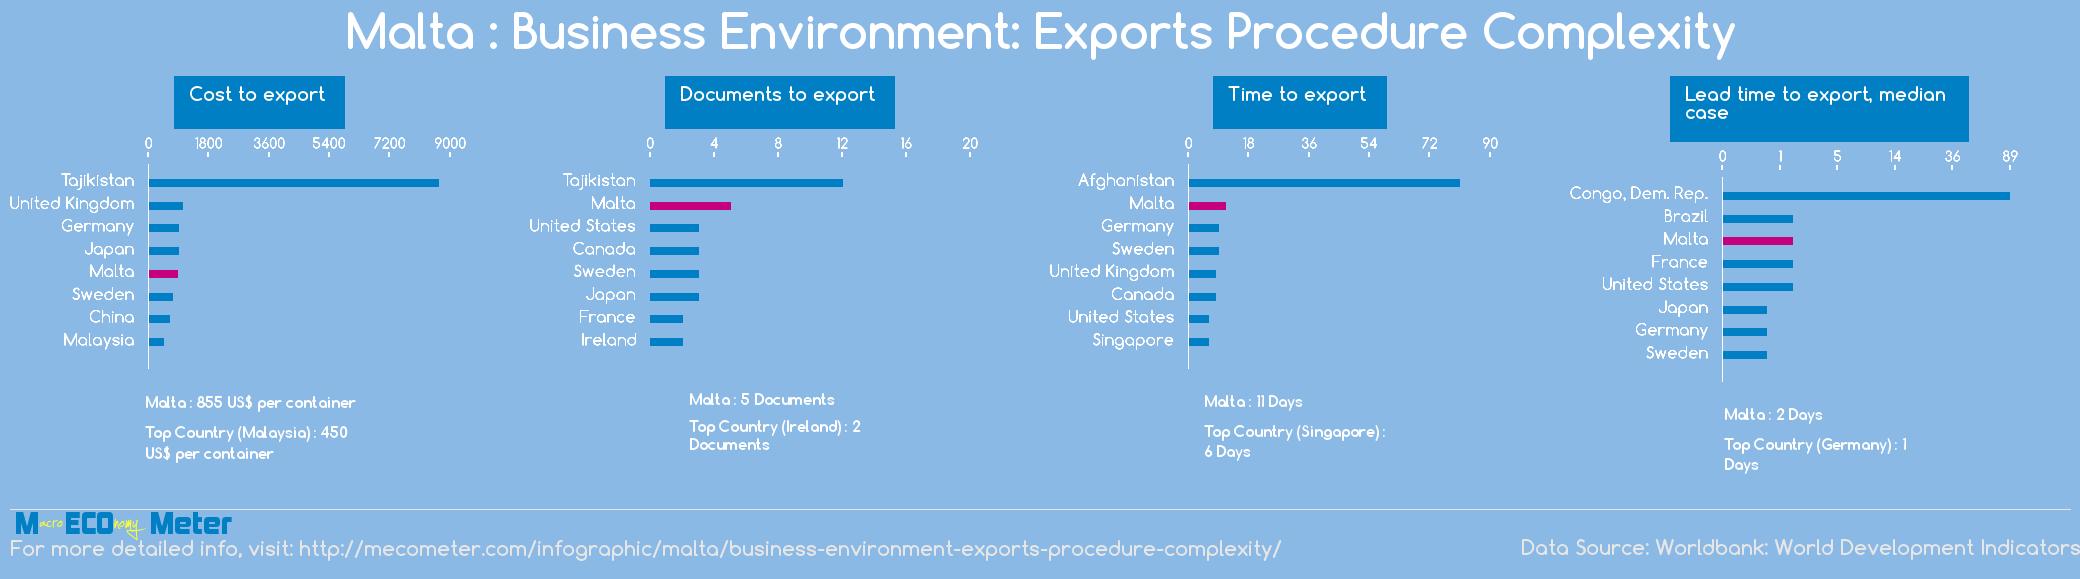 Malta : Business Environment: Exports Procedure Complexity